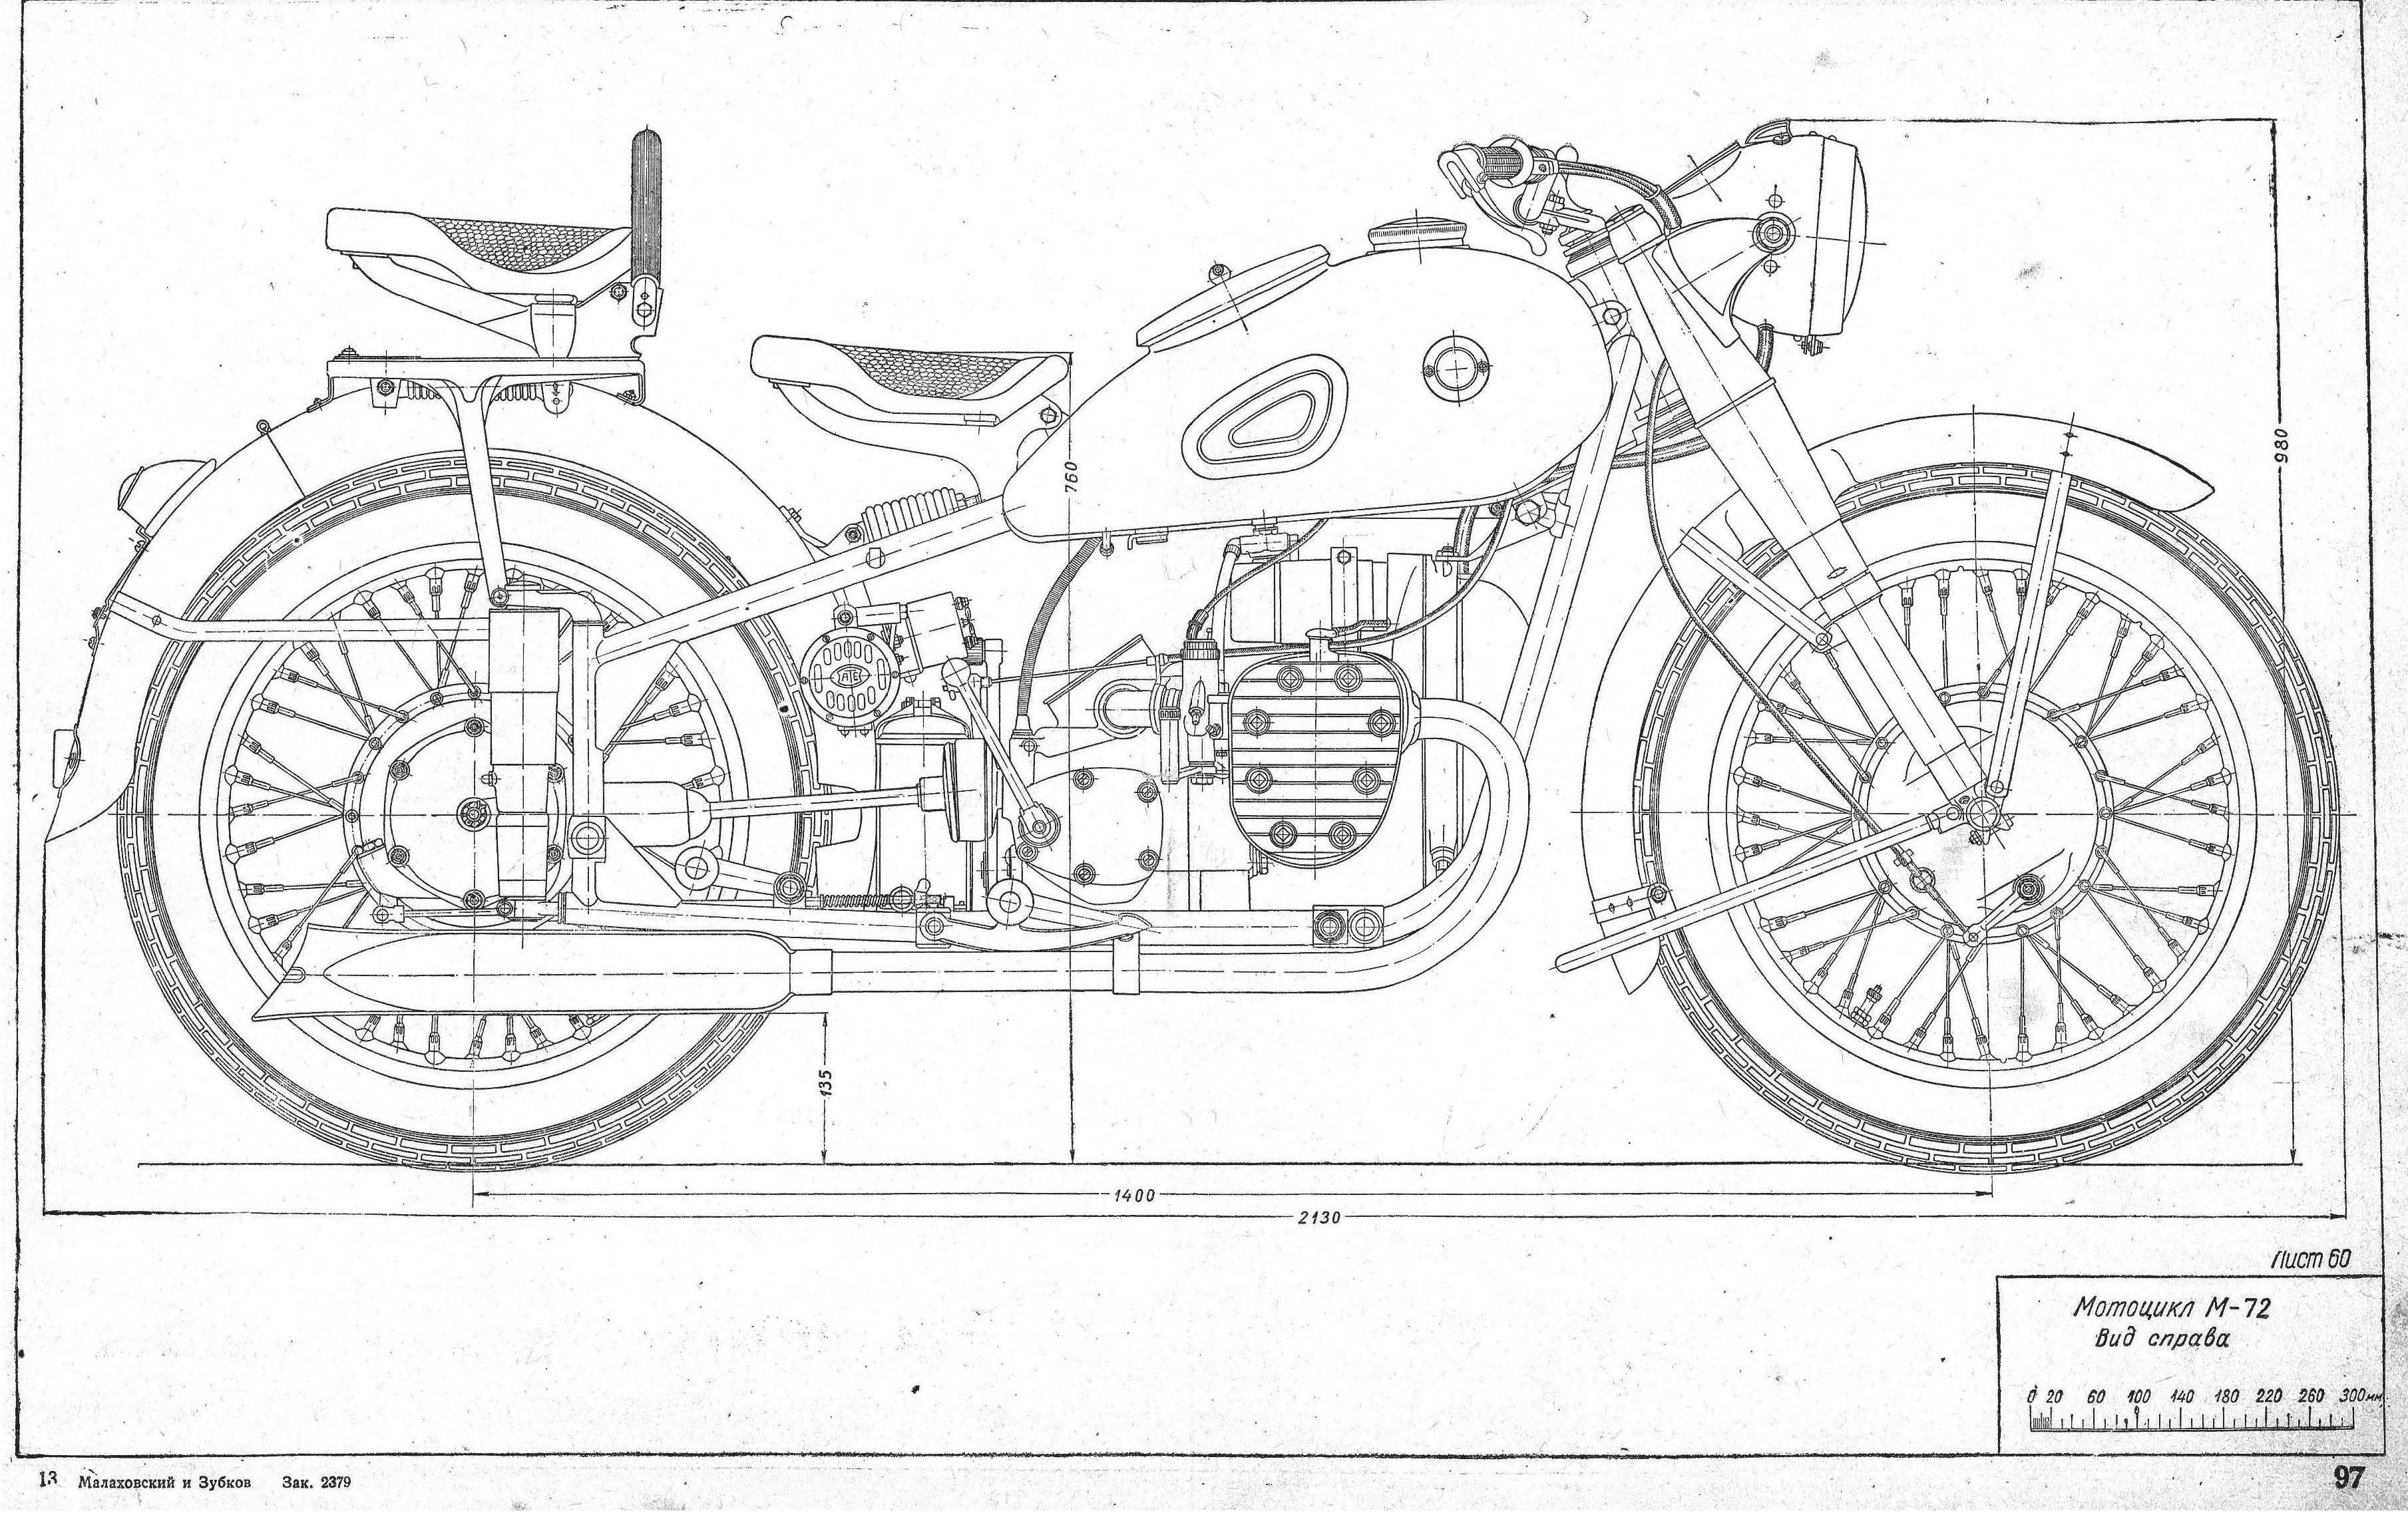 Dnepr m 72 blueprint ural moto pinterest dnepr m 72 blueprint malvernweather Images